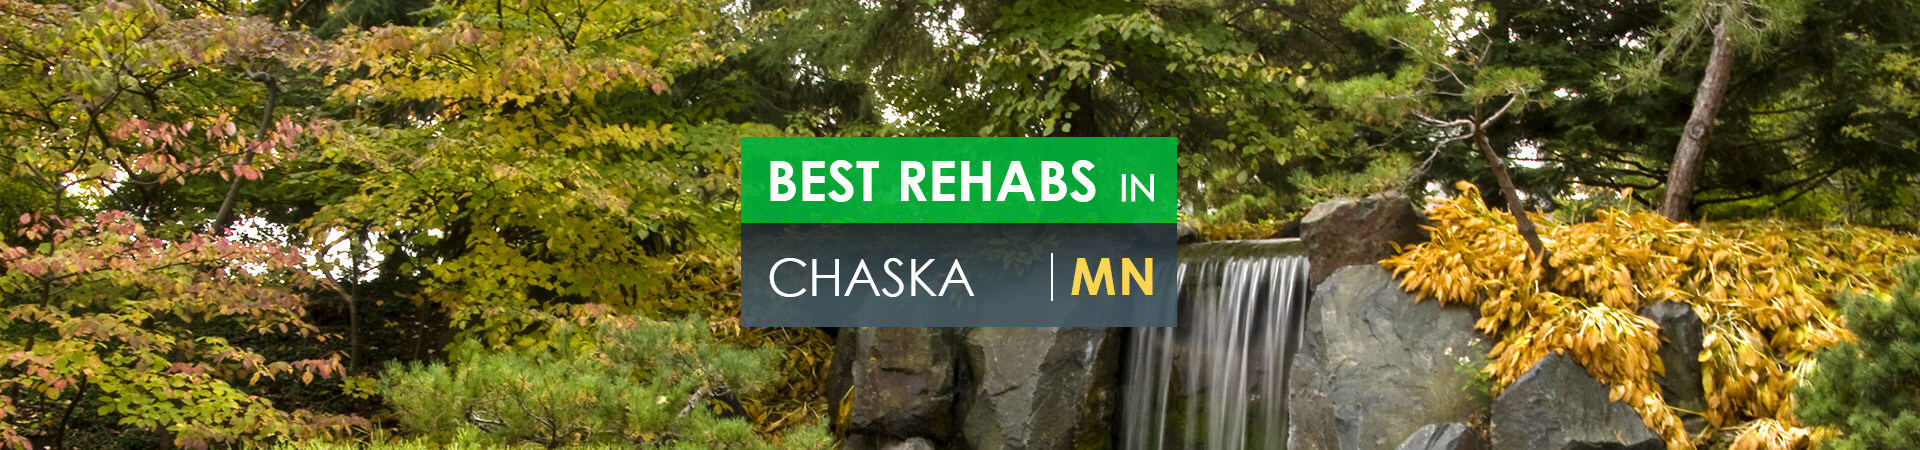 Best rehabs in Chaska, MN